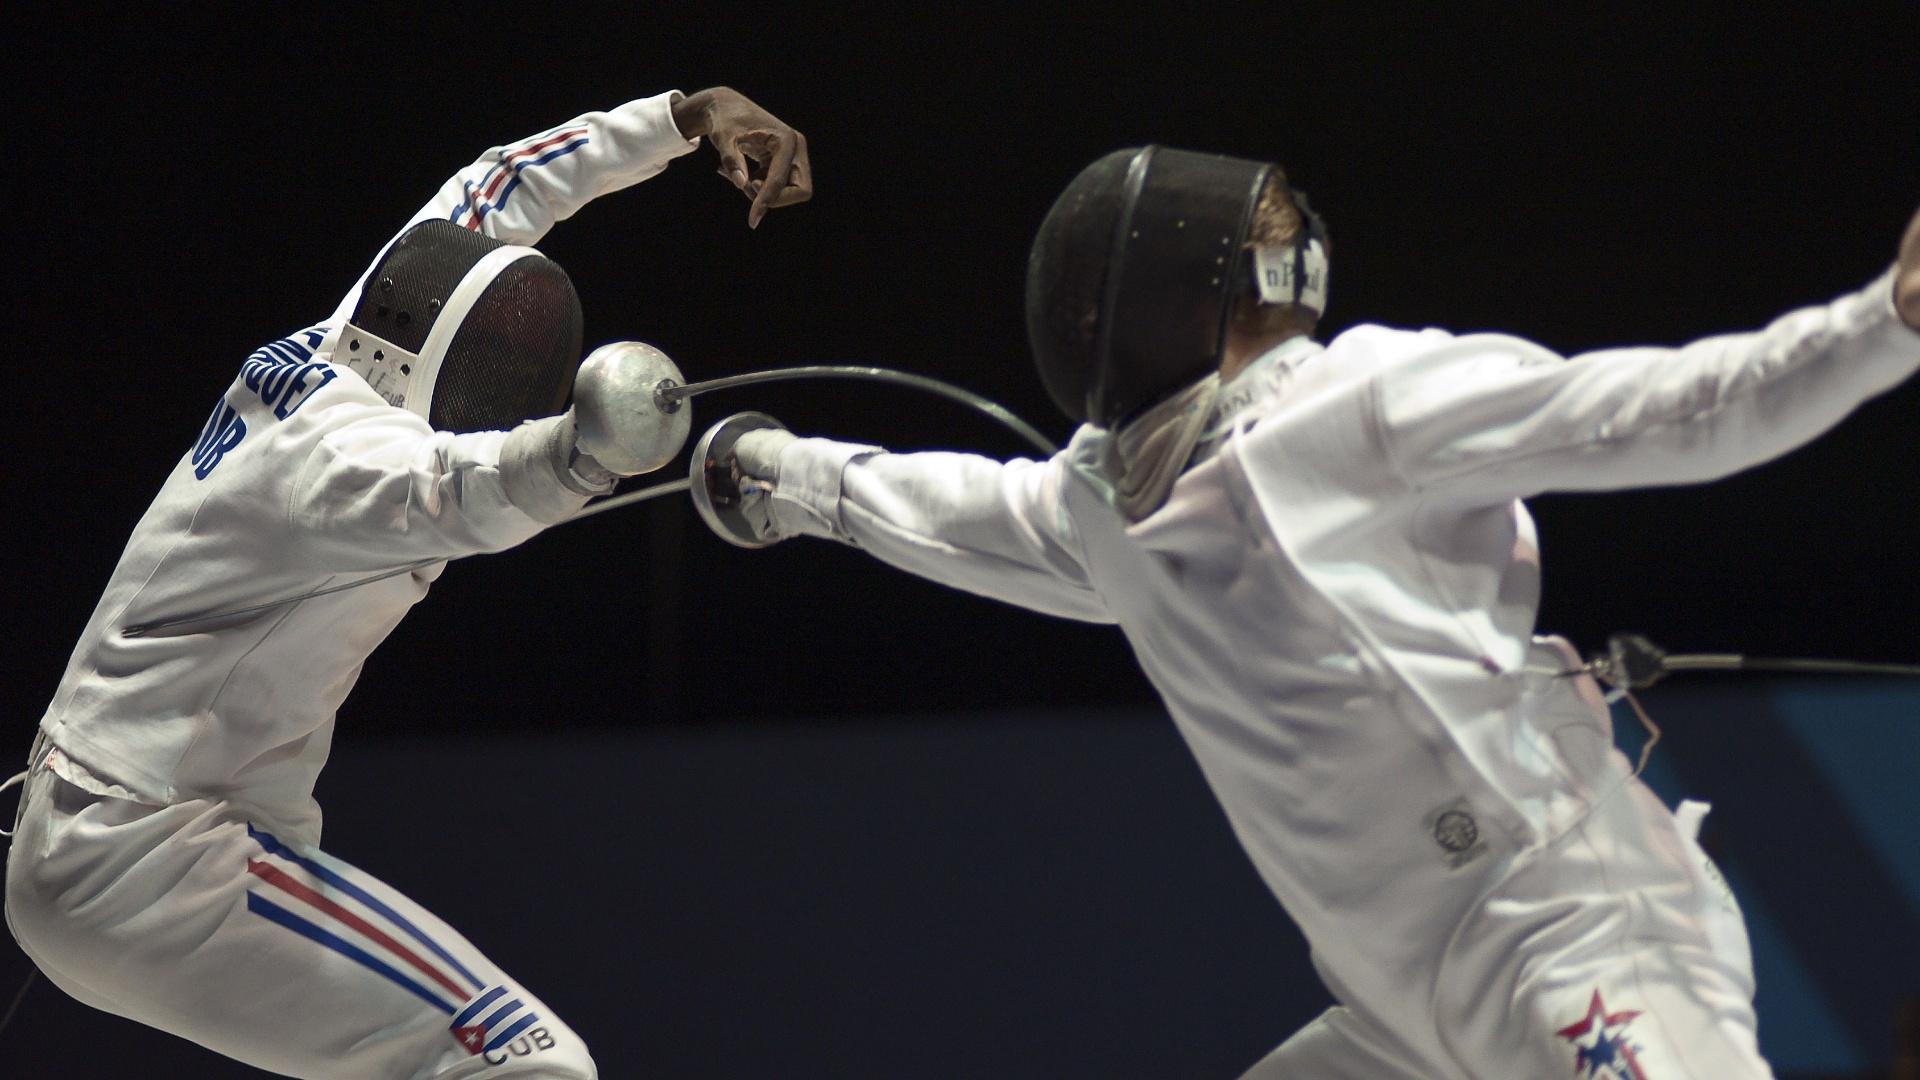 O norte-americano Weston Kelsey (dir.) derrotou o cubano Reinyer Henriquez na semifinal da espada, na esgrima